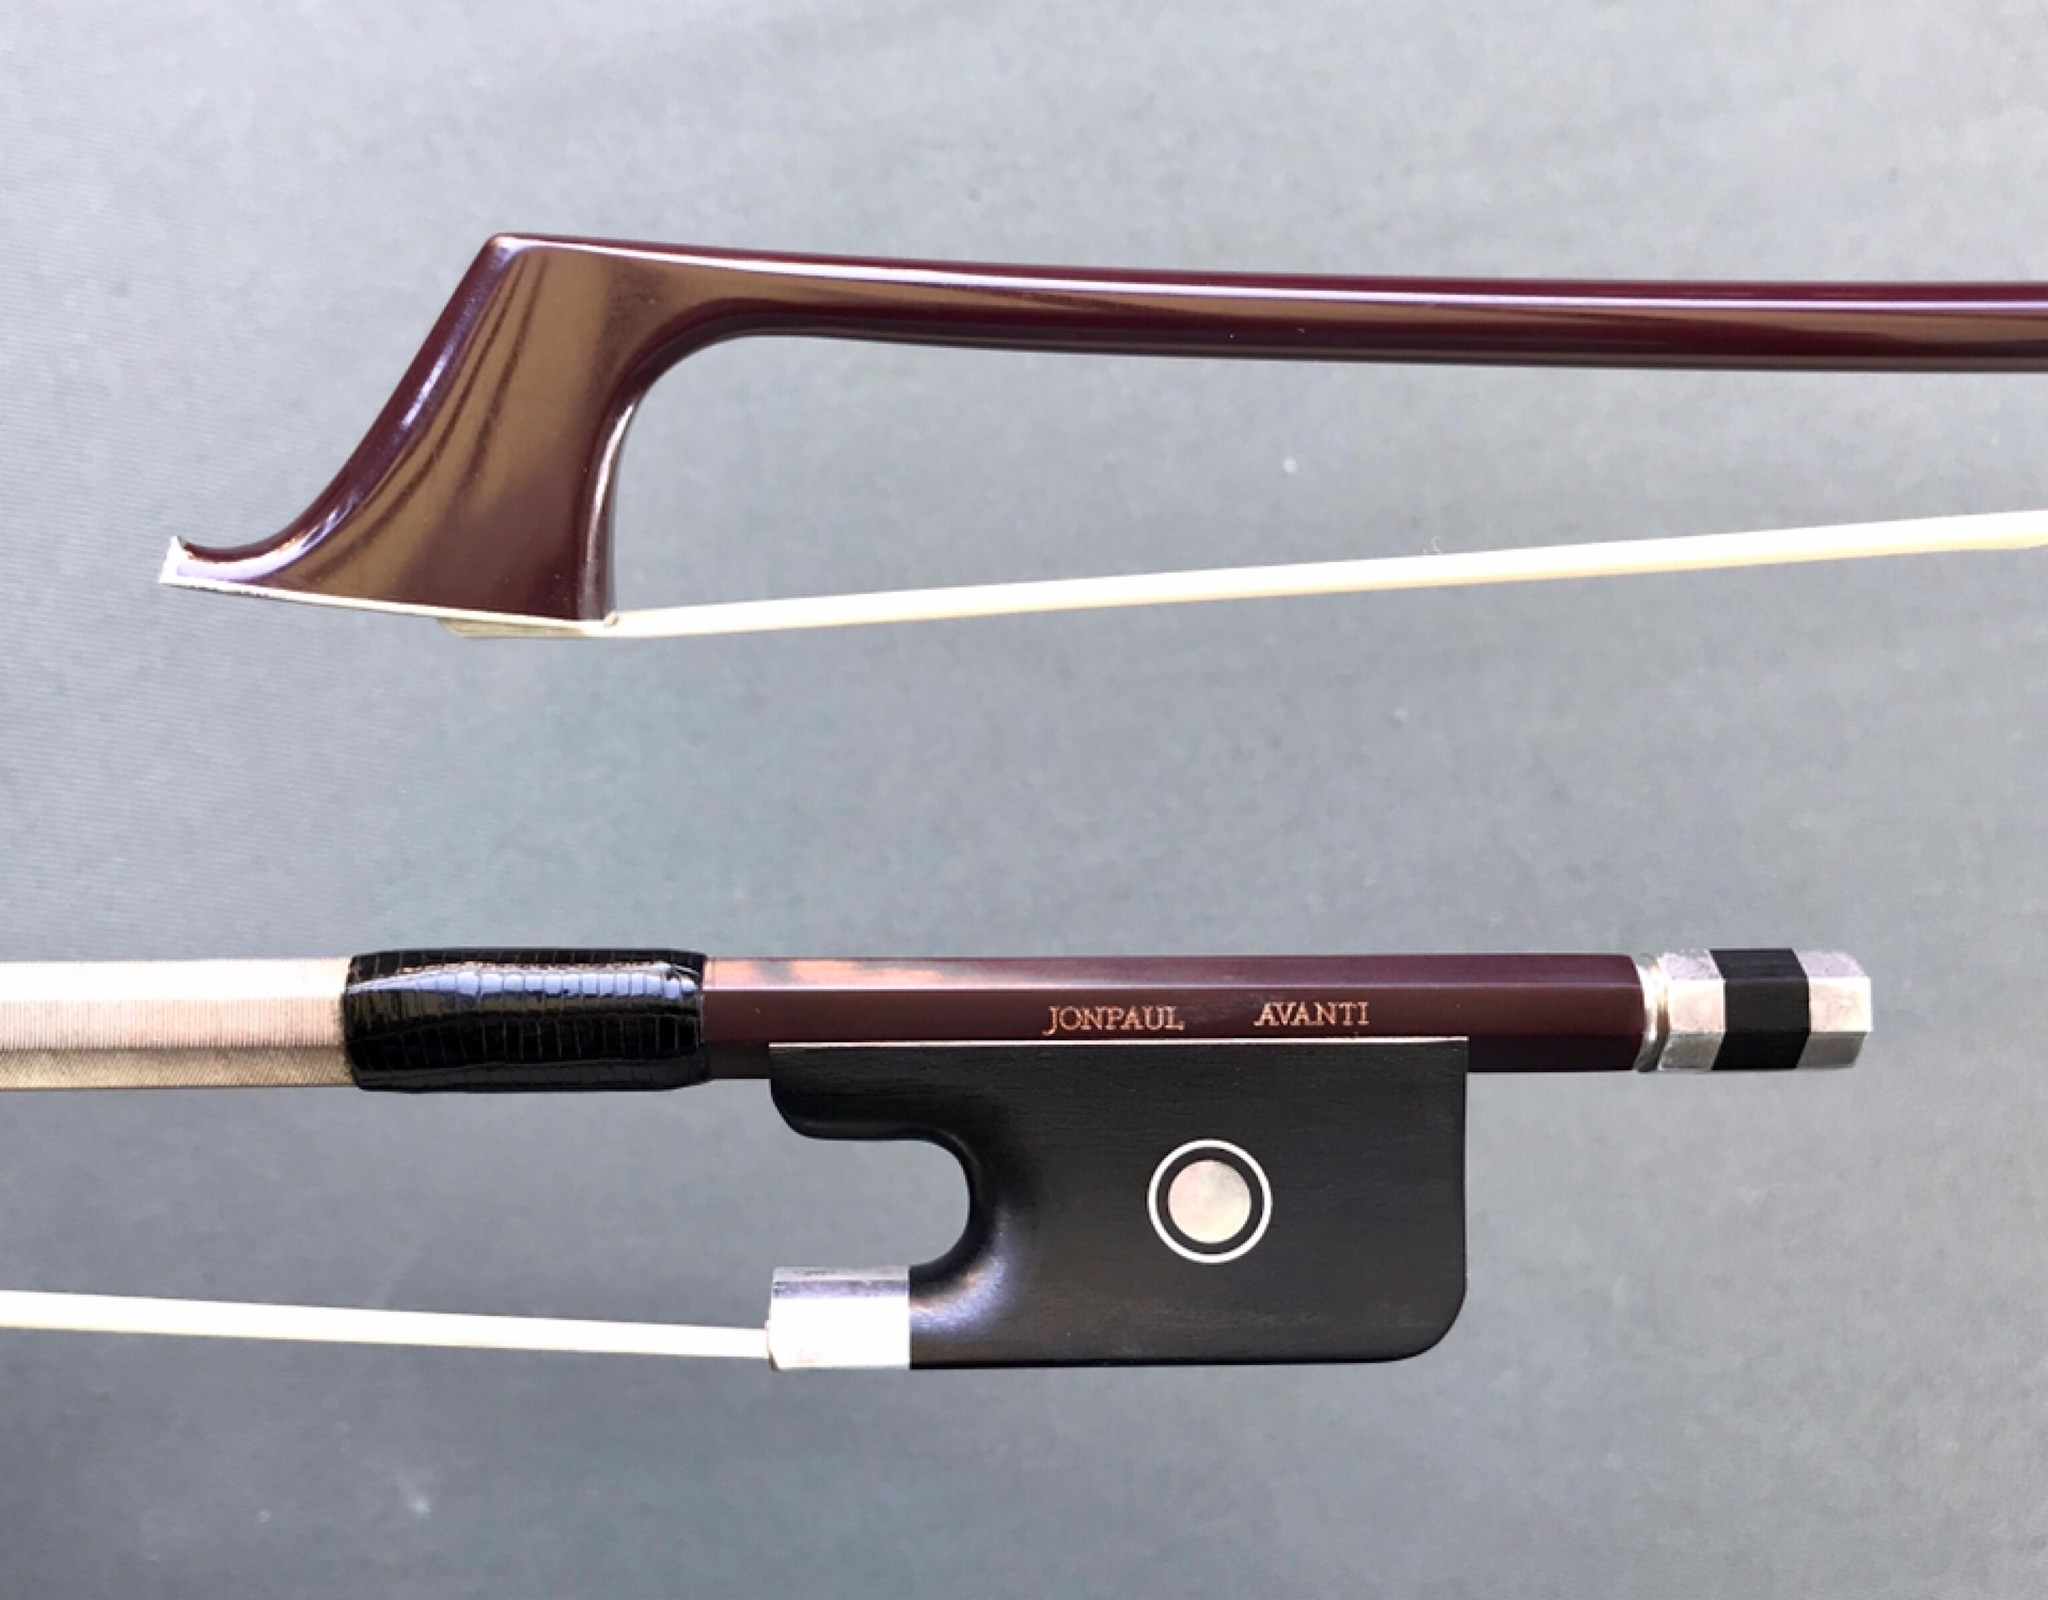 JonPaul JonPaul AVANTI silver, burgundy carbon-fiber cello bow, USA